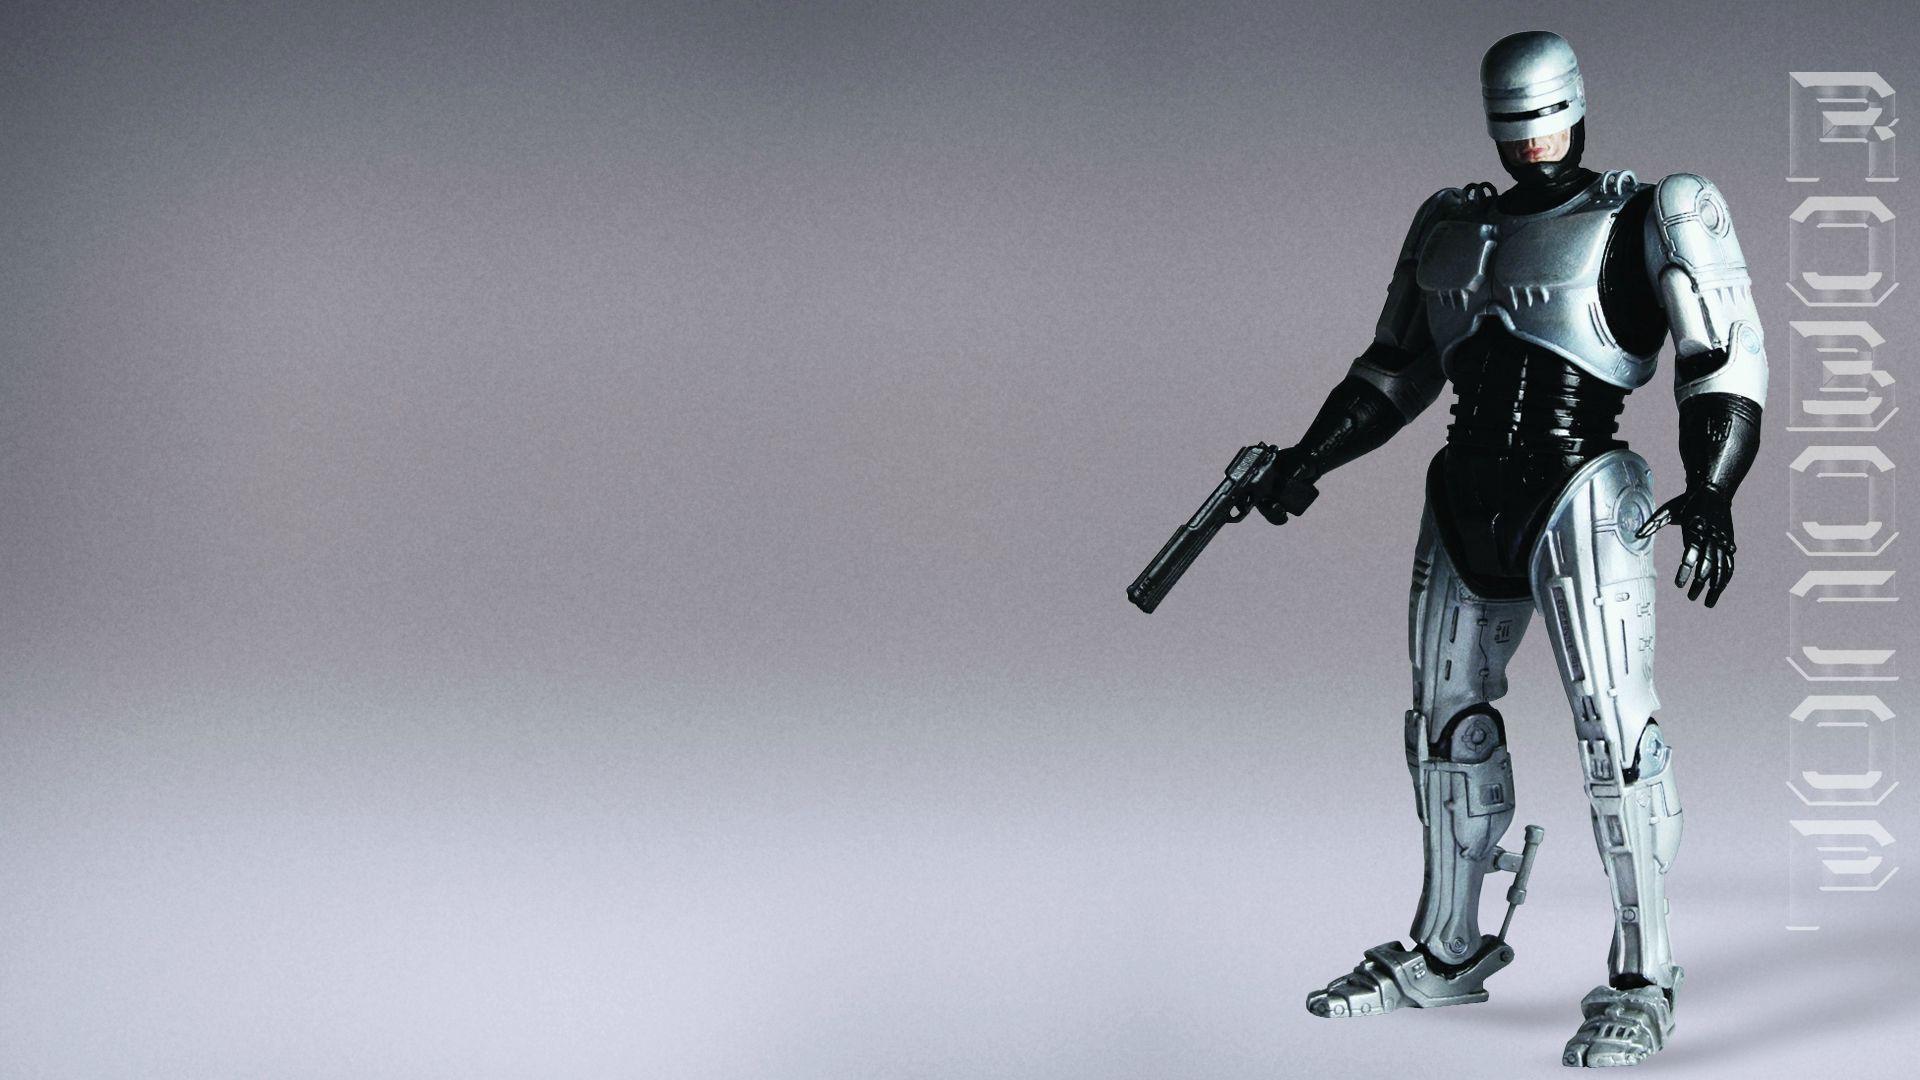 94 RoboCop HD Wallpapers | Backgrounds - Wallpaper Abyss